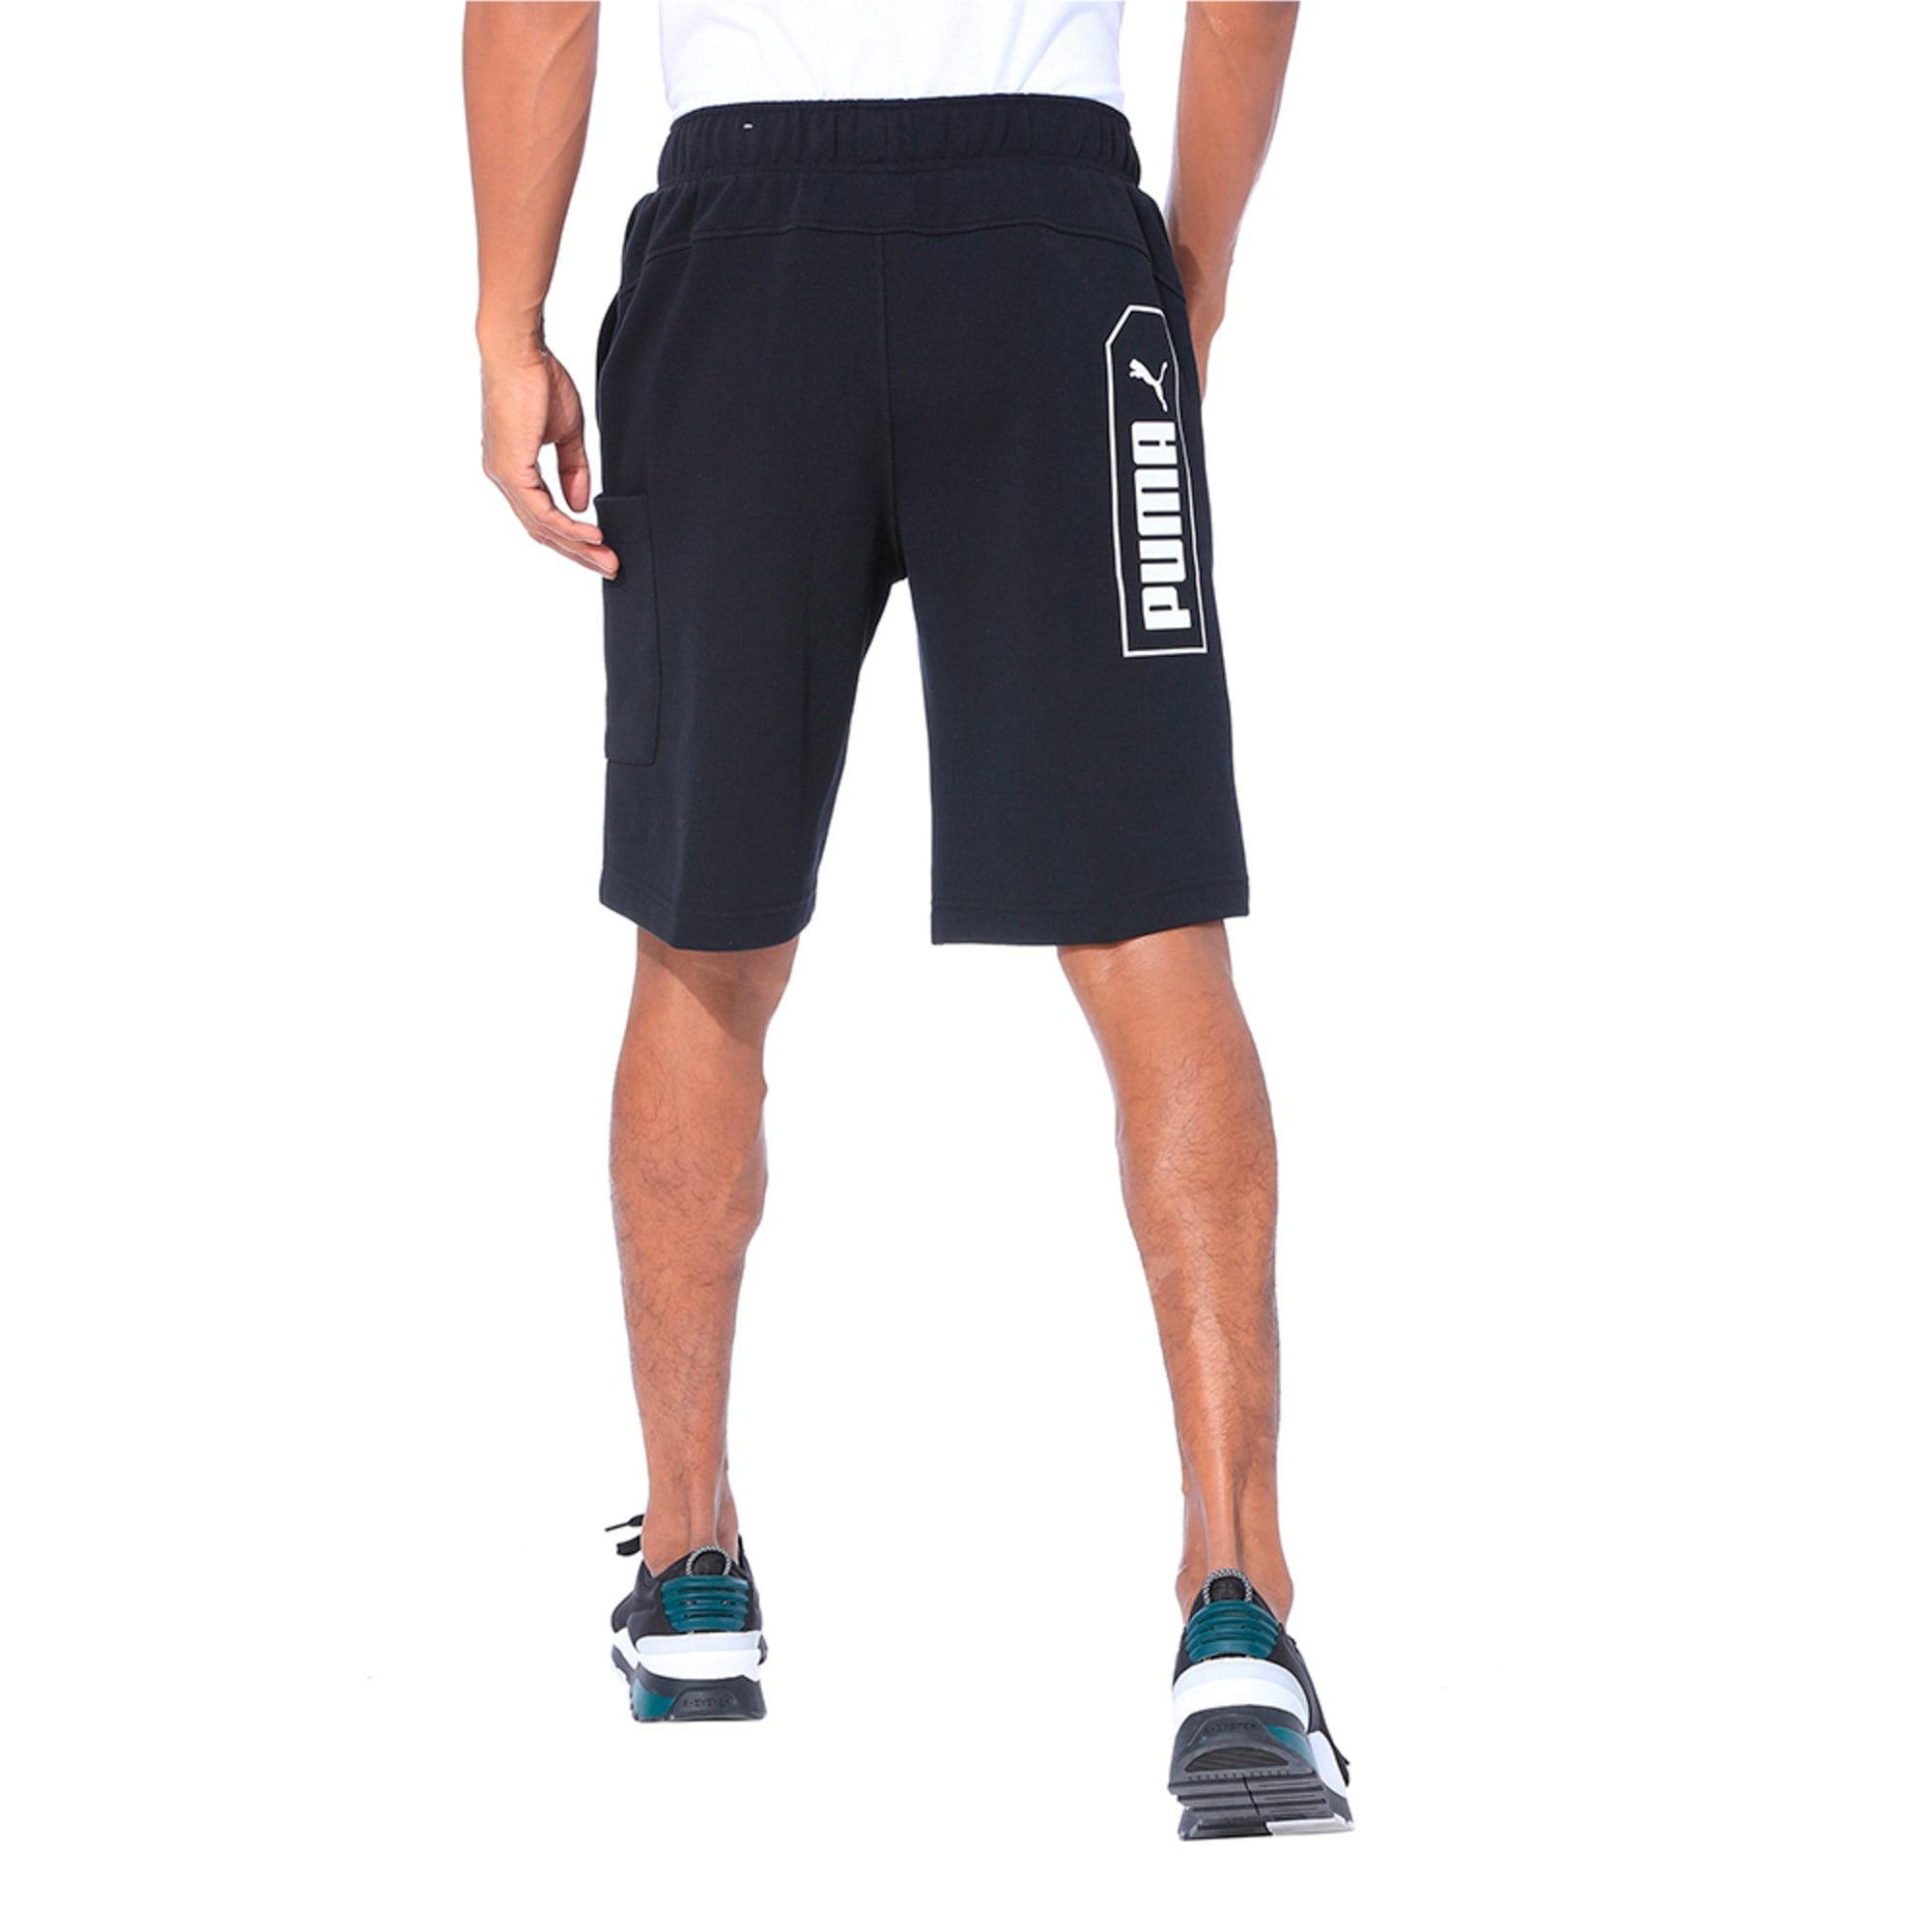 Thumbnail 2 of NU-TILITY Men's Shorts, Puma Black, medium-IND